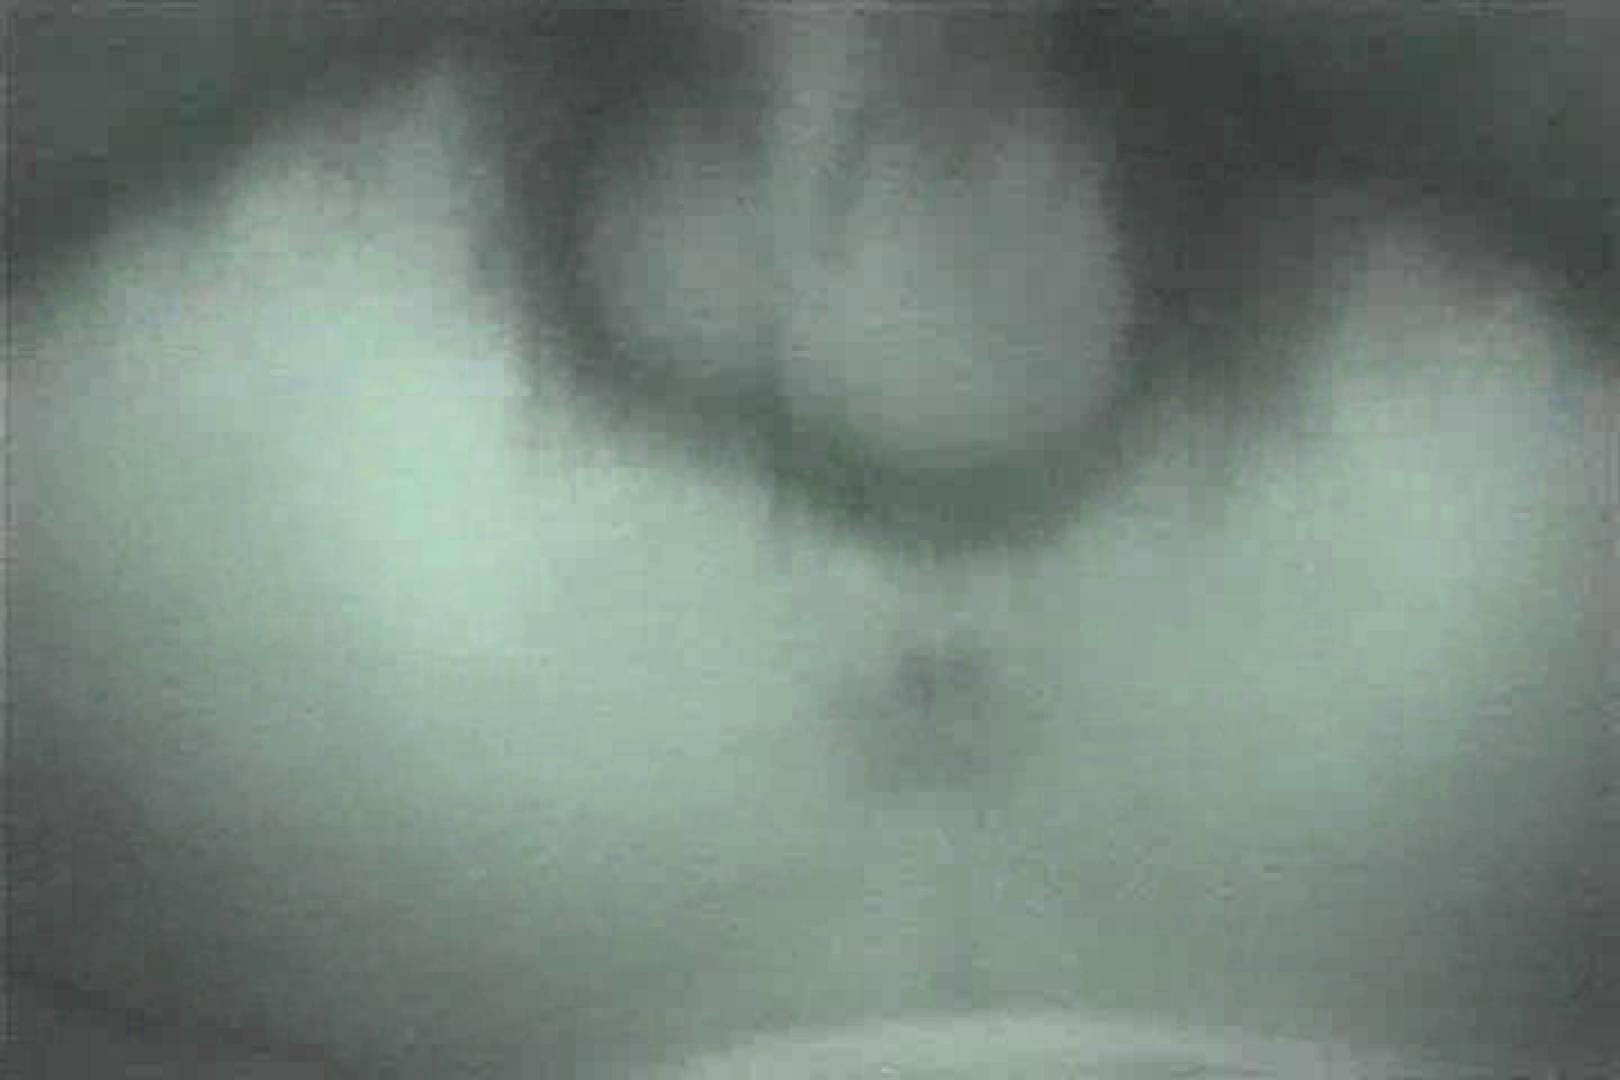 MASAさんの待ち伏せ撮り! 赤外線カーセックスVol.19 OLヌード天国 ぱこり動画紹介 75PIX 17